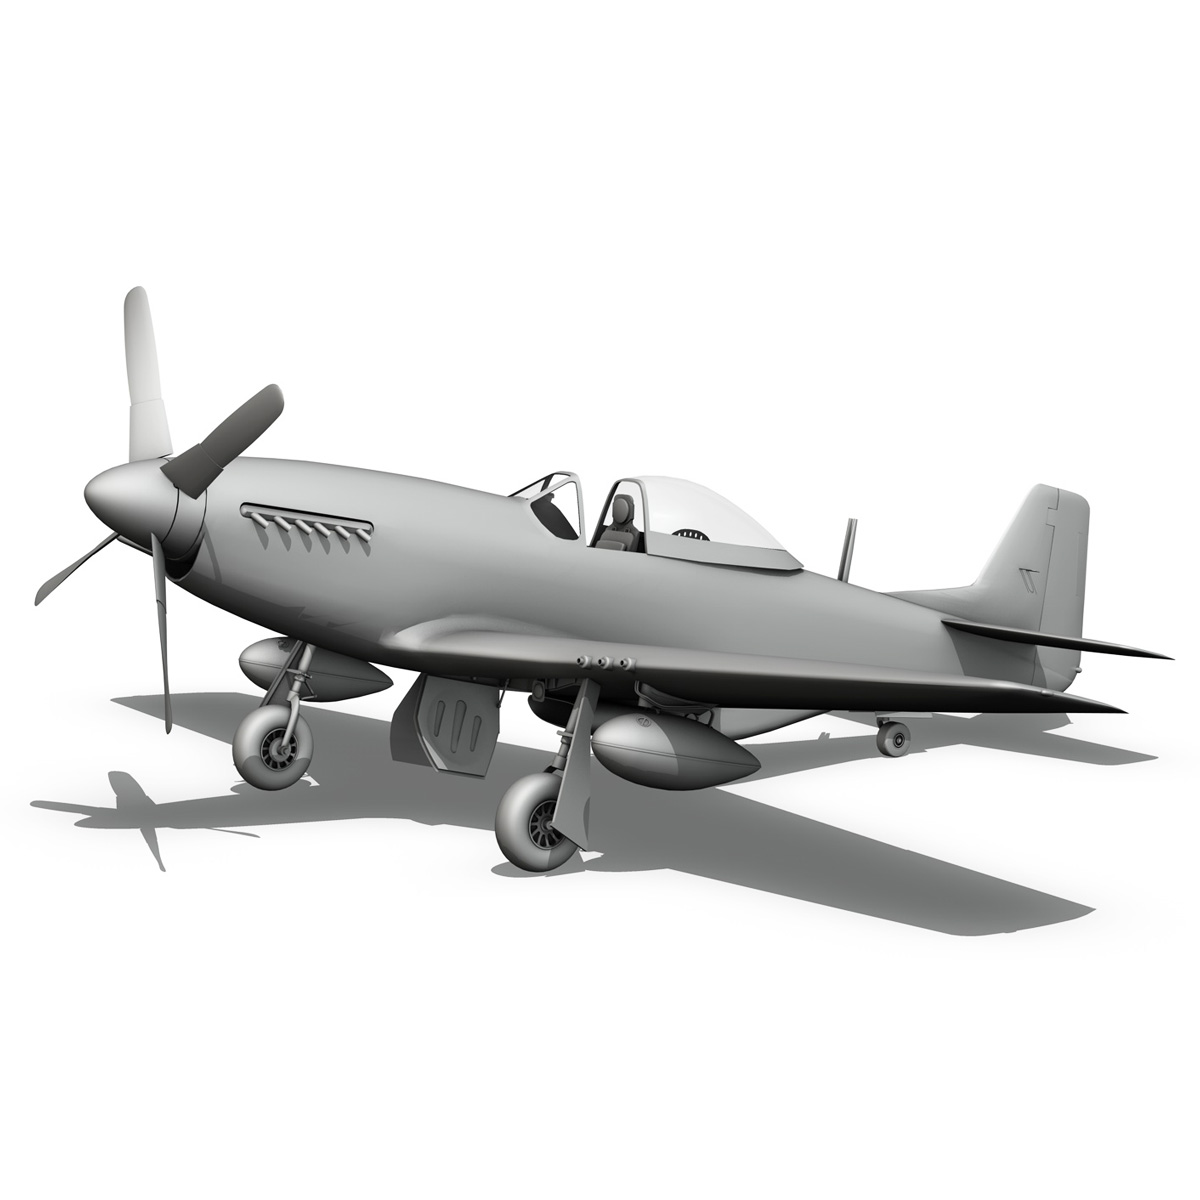 north american p-51d mustang – petie 3rd 3d model fbx c4d lwo obj 280145